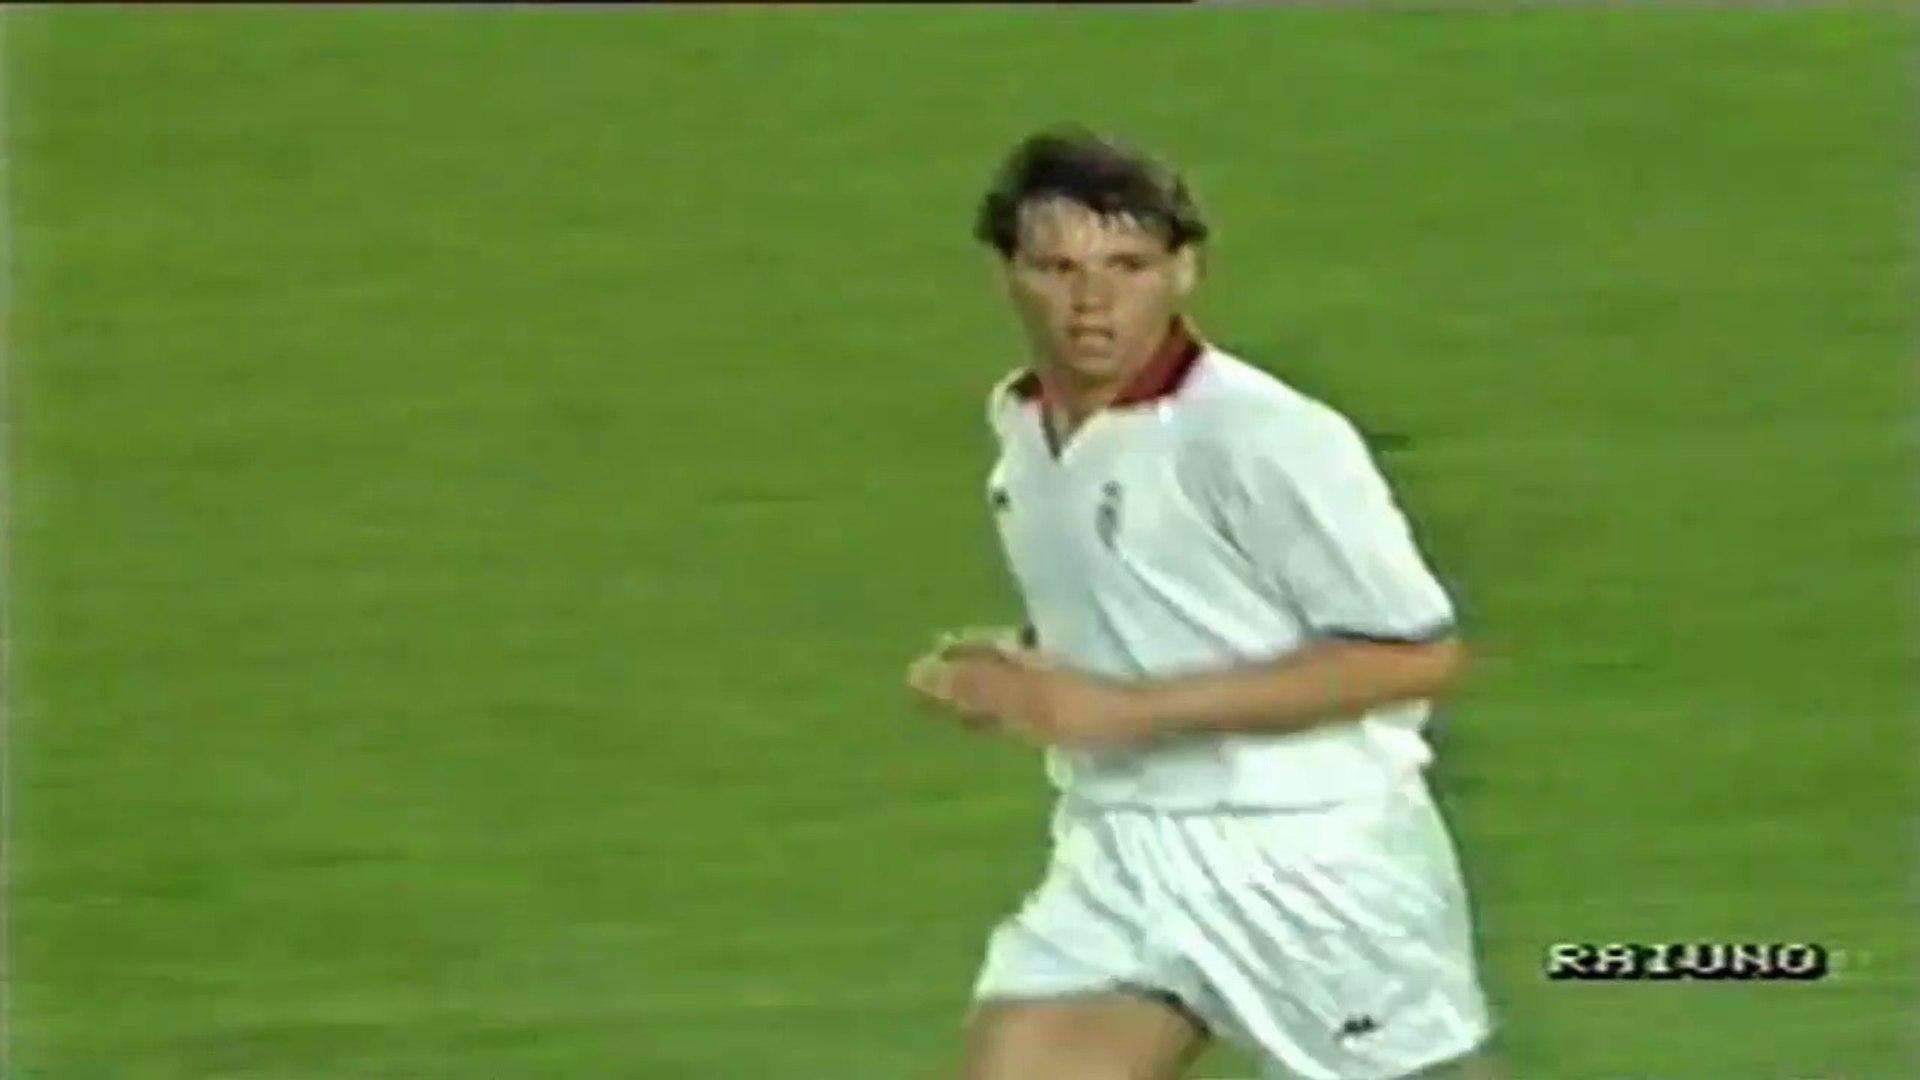 Marco van Basten ● Skills ● AC Milan 1:0 Benfica ● European Champion Clubs' Cup Final 1989-90